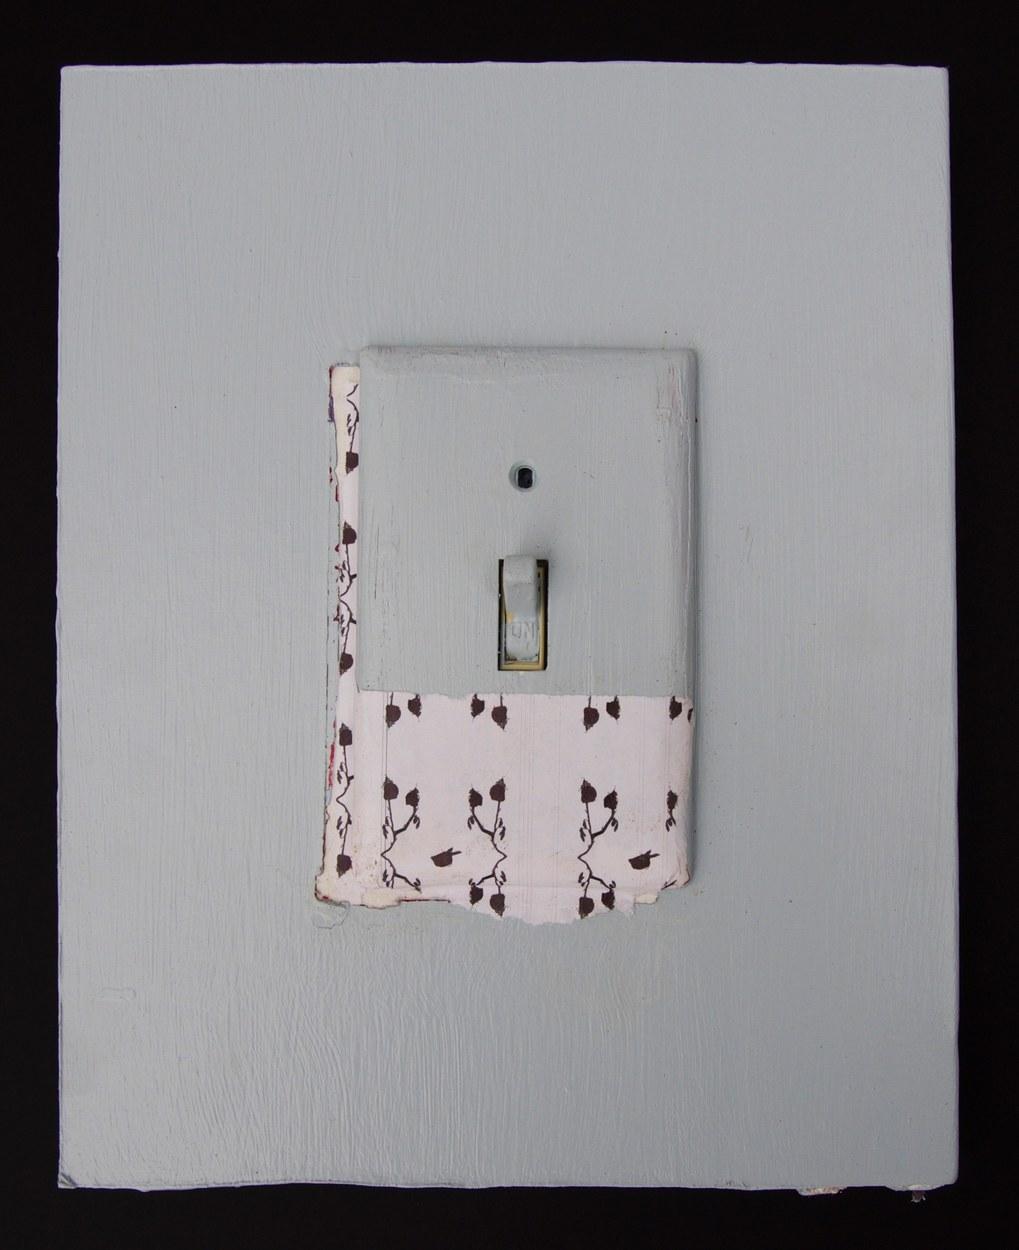 Second Bedroom (Light Switch)